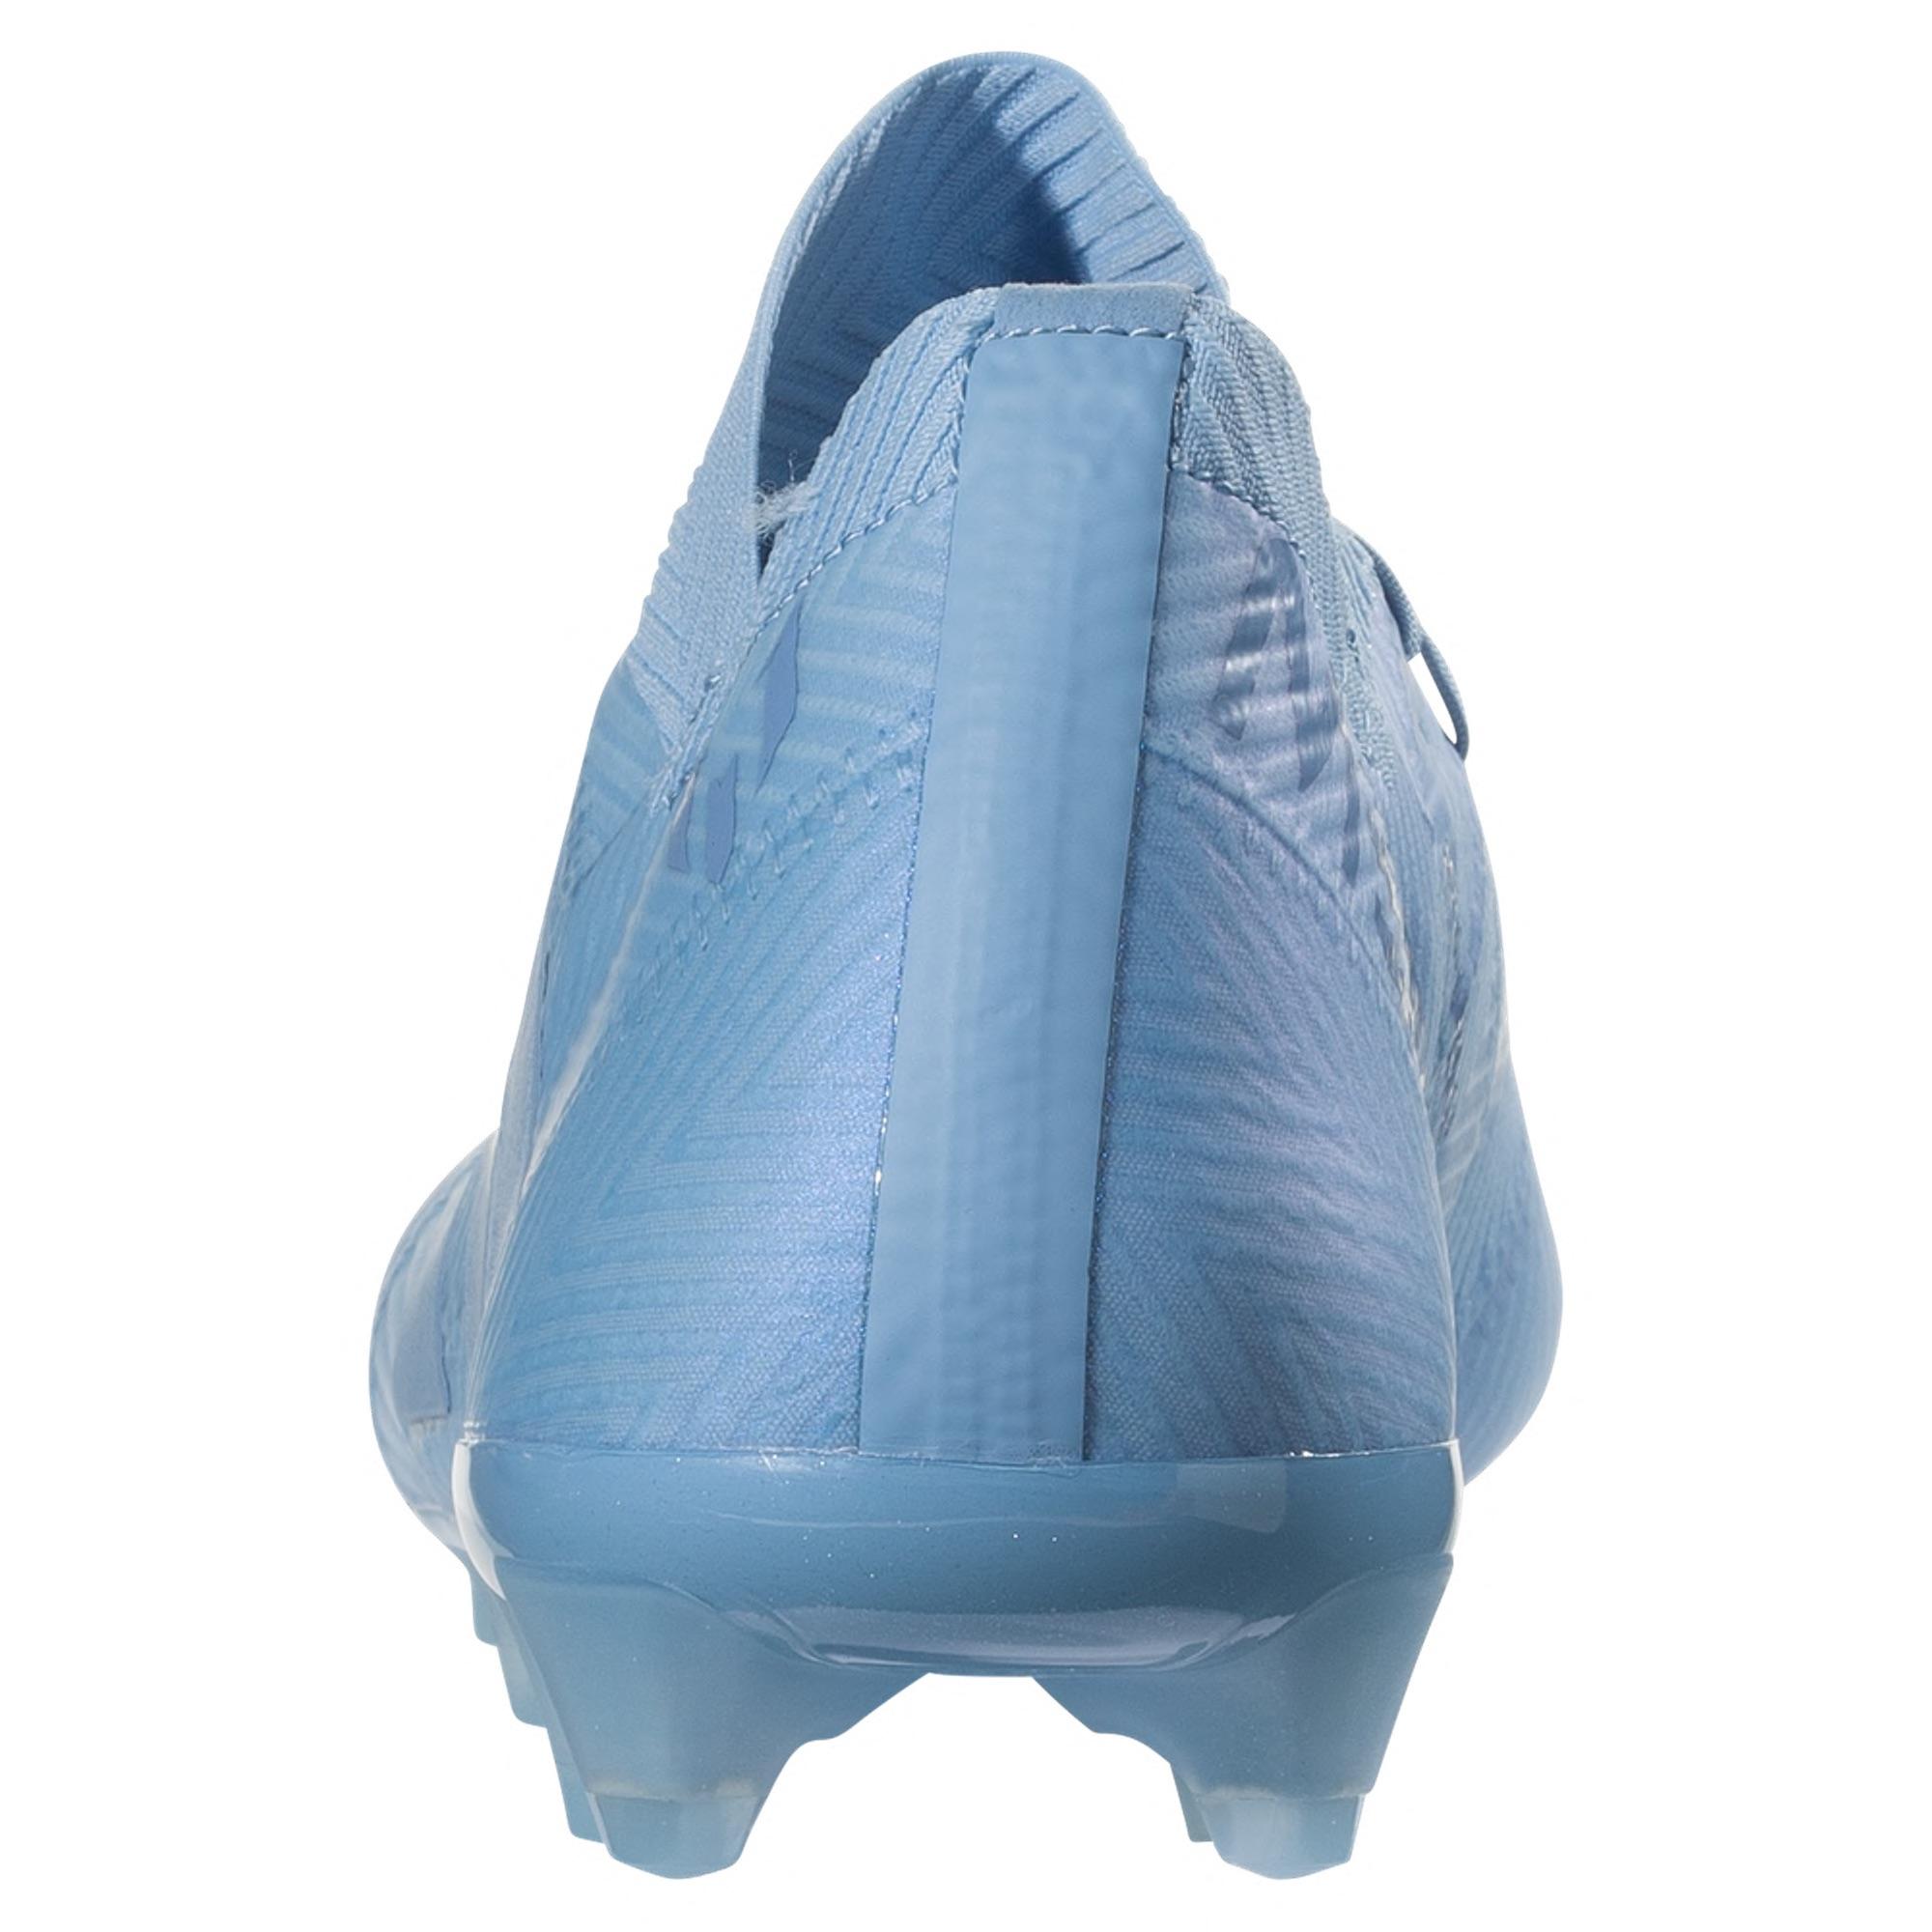 04fb55d45 Home   Brand   Adidas   adidas Nemeziz Messi 18.1 FG Soccer Cleats – Ash  Blue Ash Blue Raw Grey